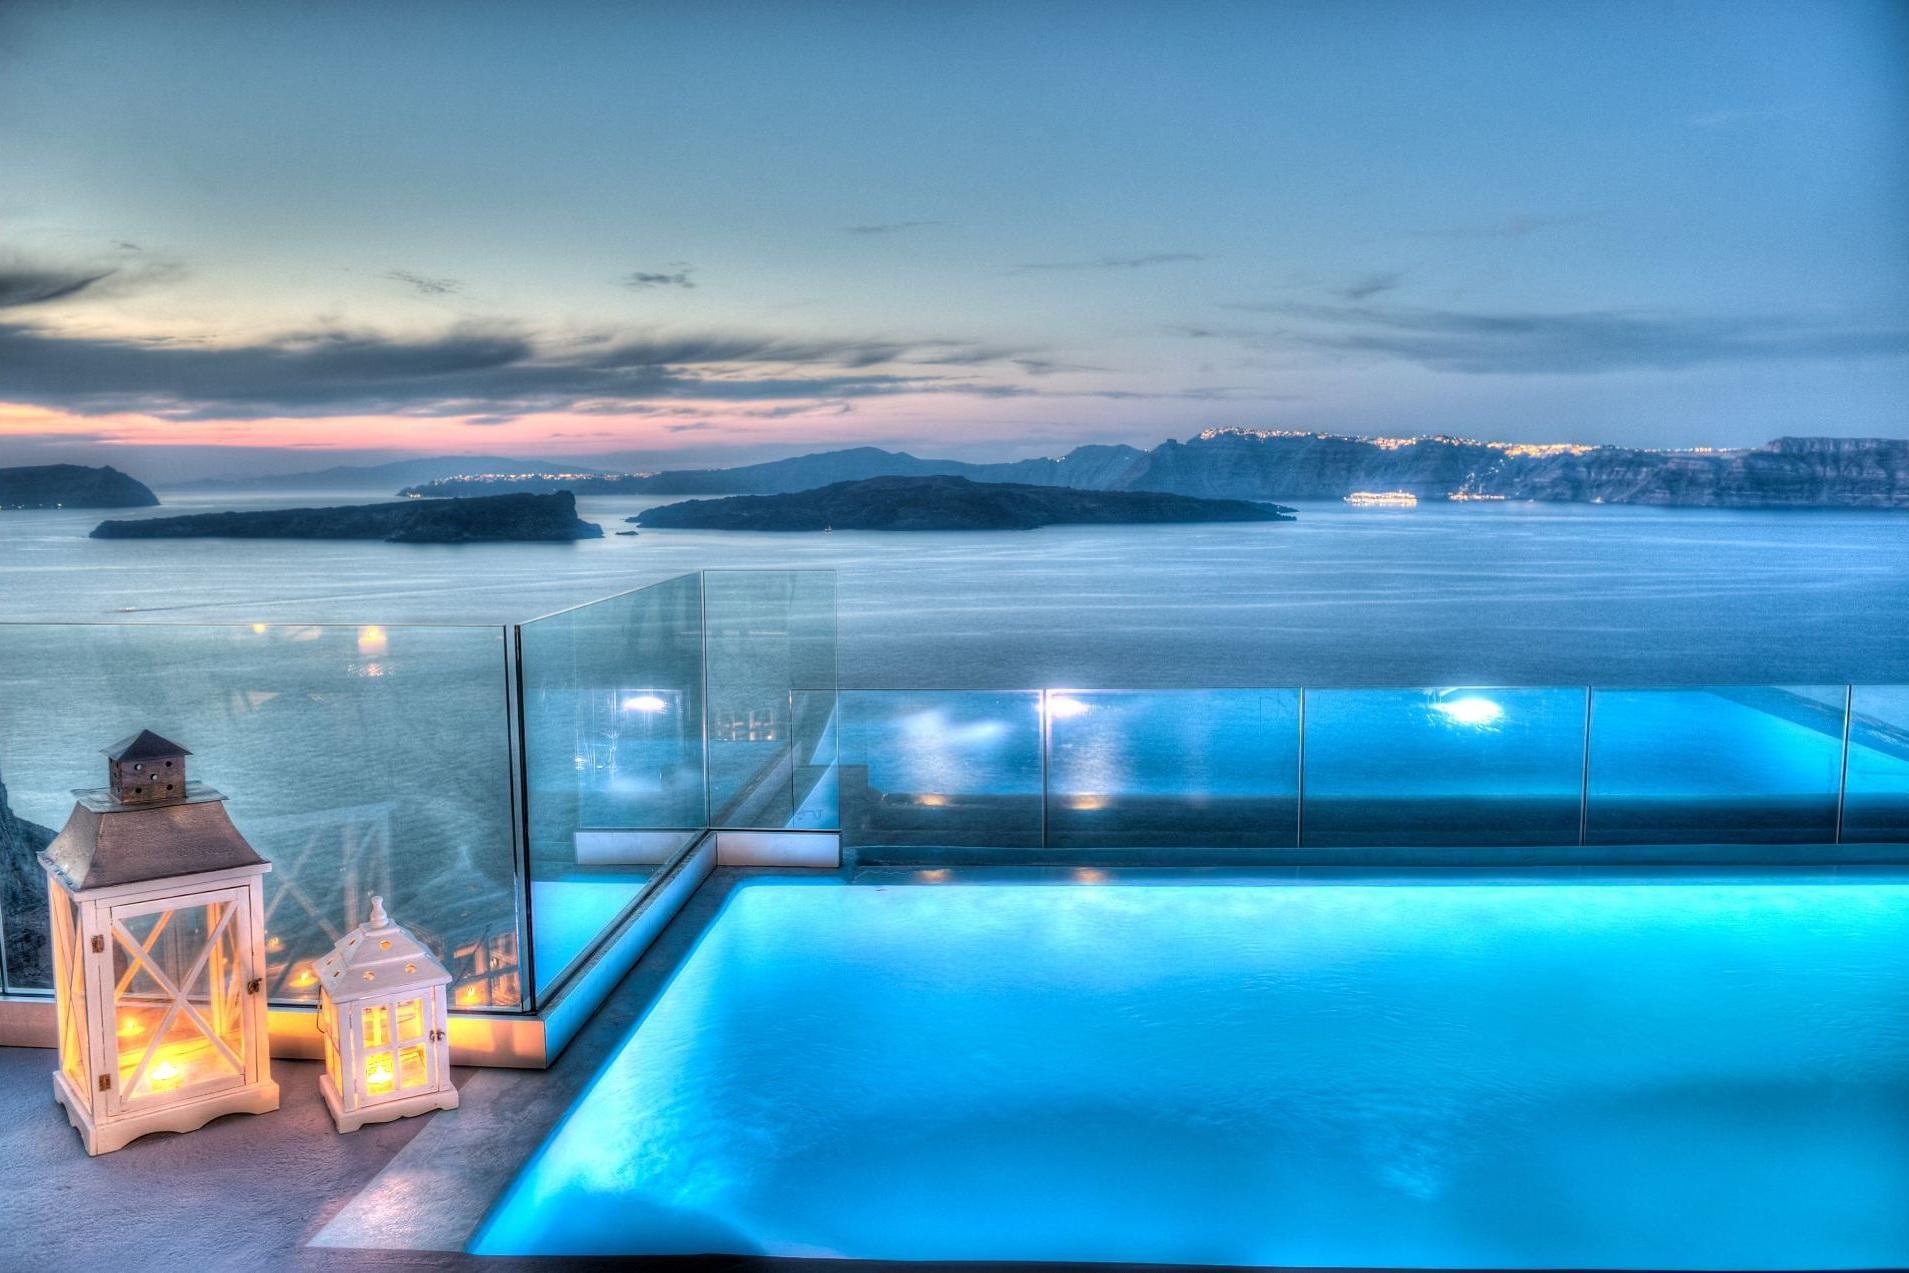 Astarte_Suite_private_infinity_pool_Santorini_A4_at_night.jpg